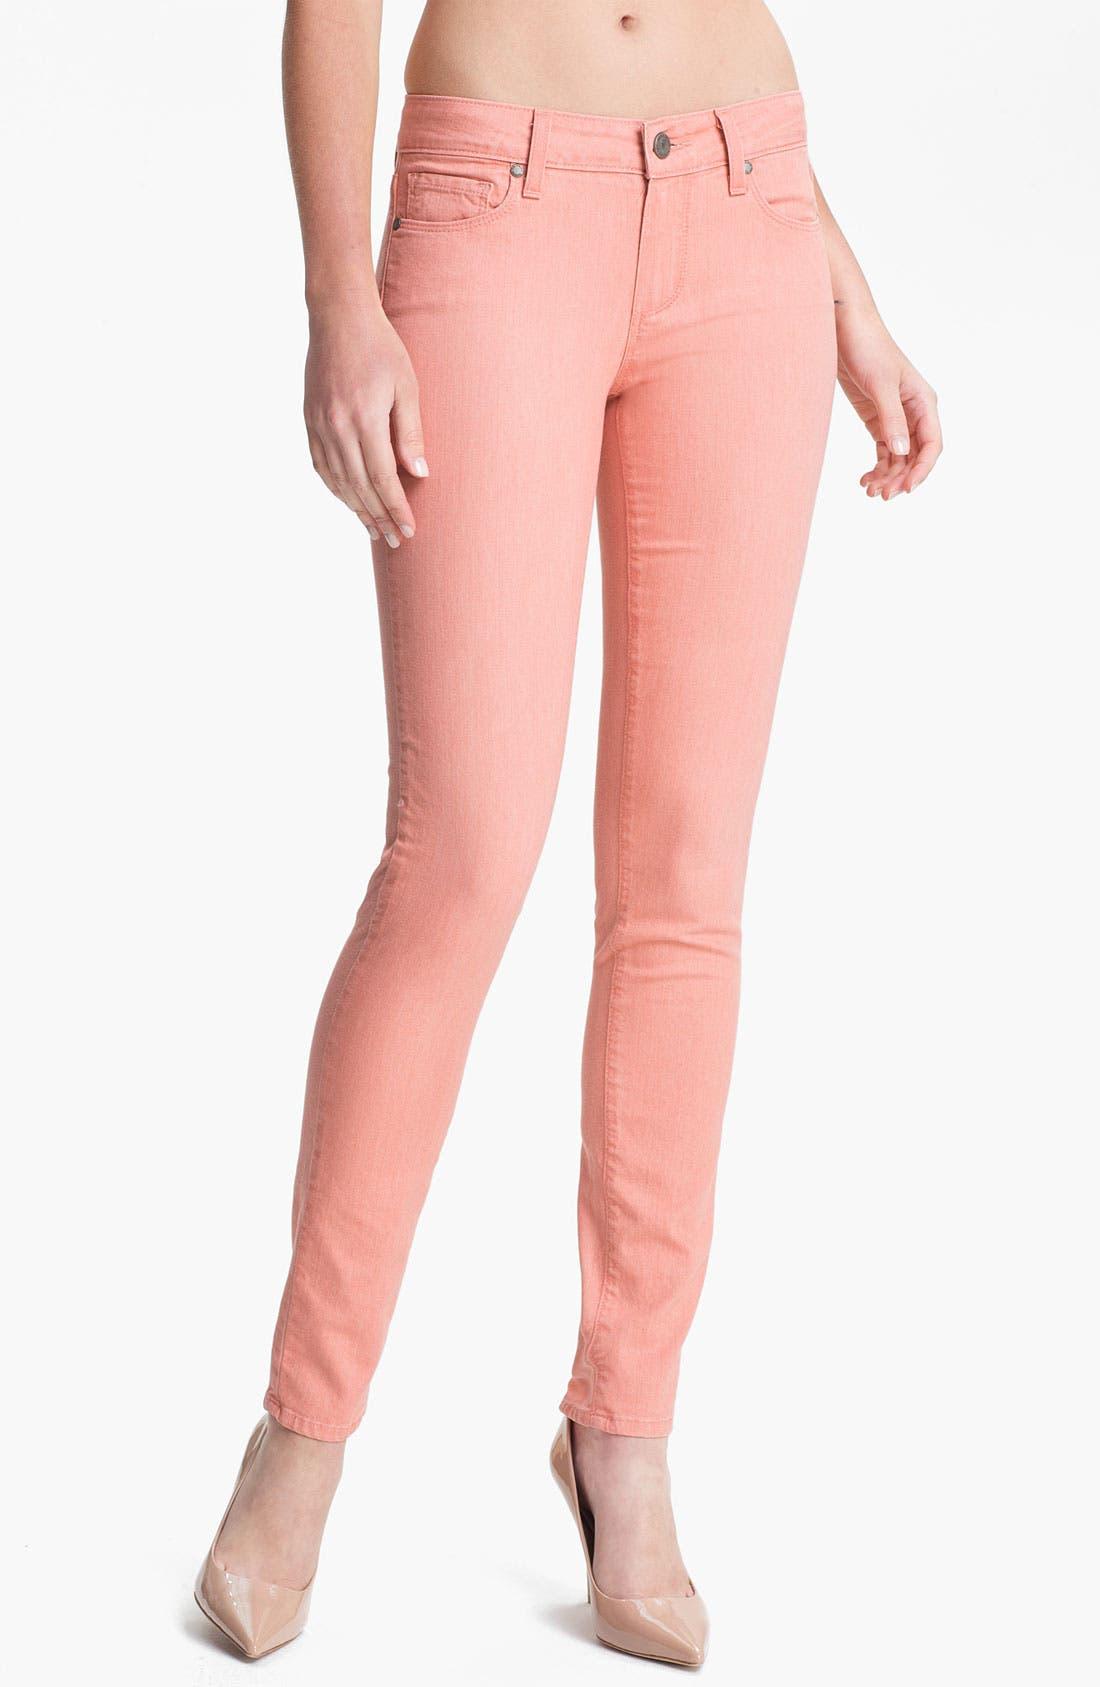 Alternate Image 1 Selected - Paige Denim 'Verdugo' Skinny Stretch Jeans (Peach)